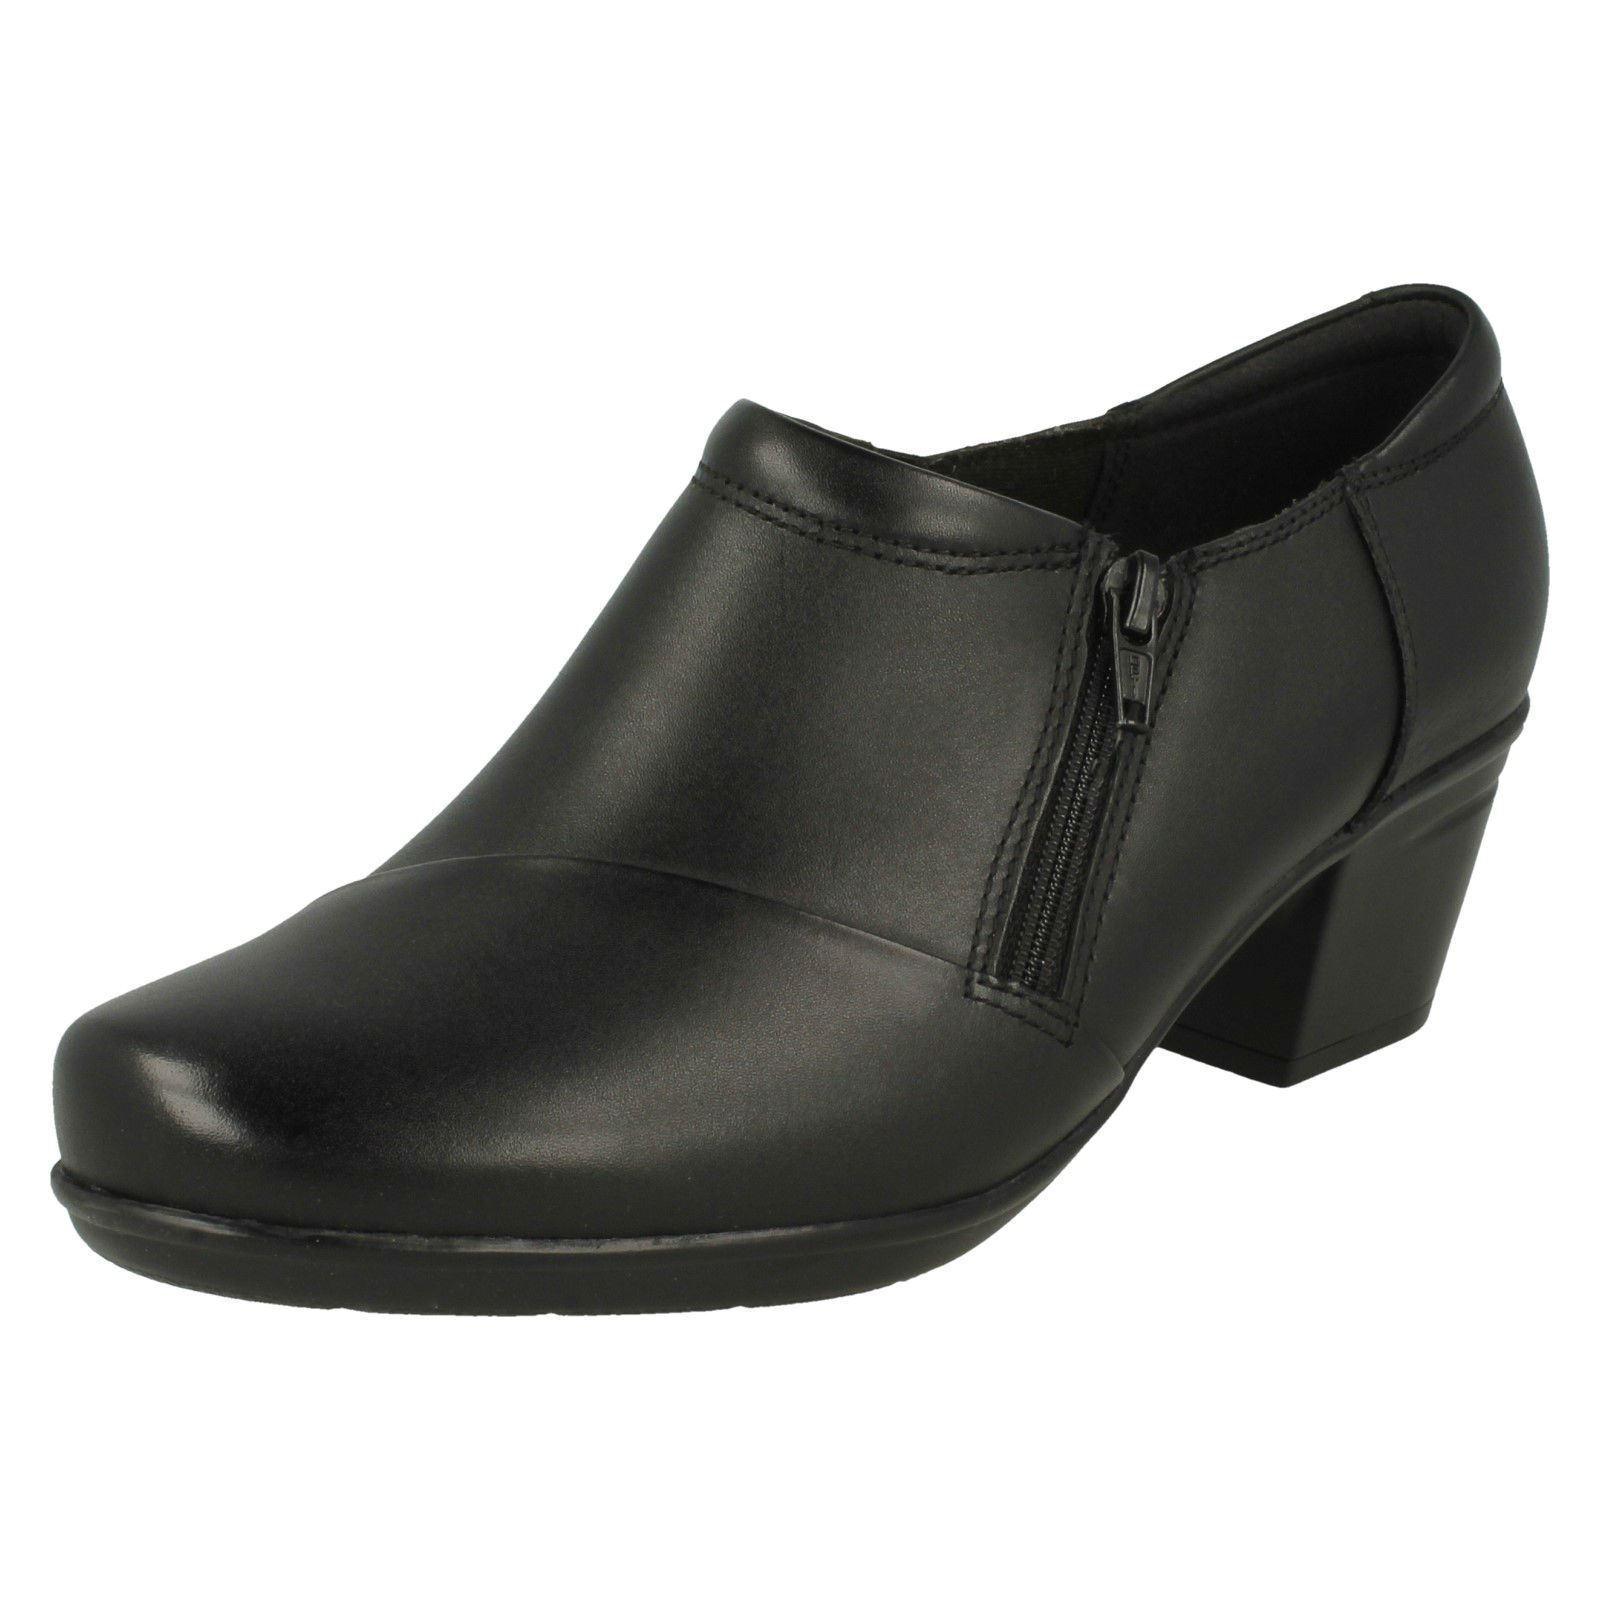 Mesdames Smart Pantalon chaussures 'em slie Claudia